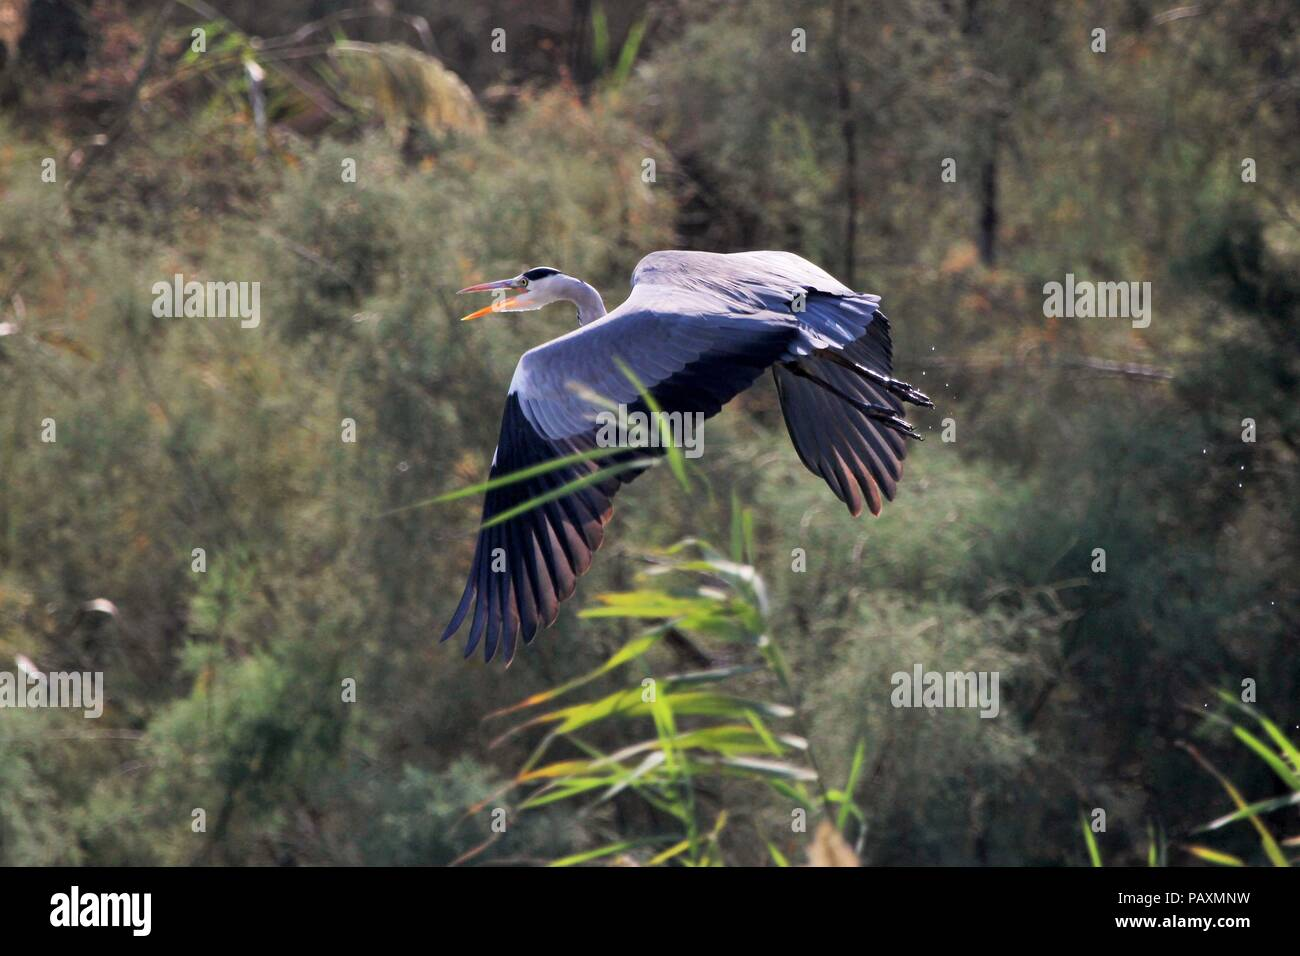 A gray heron flew through the trees - Stock Image